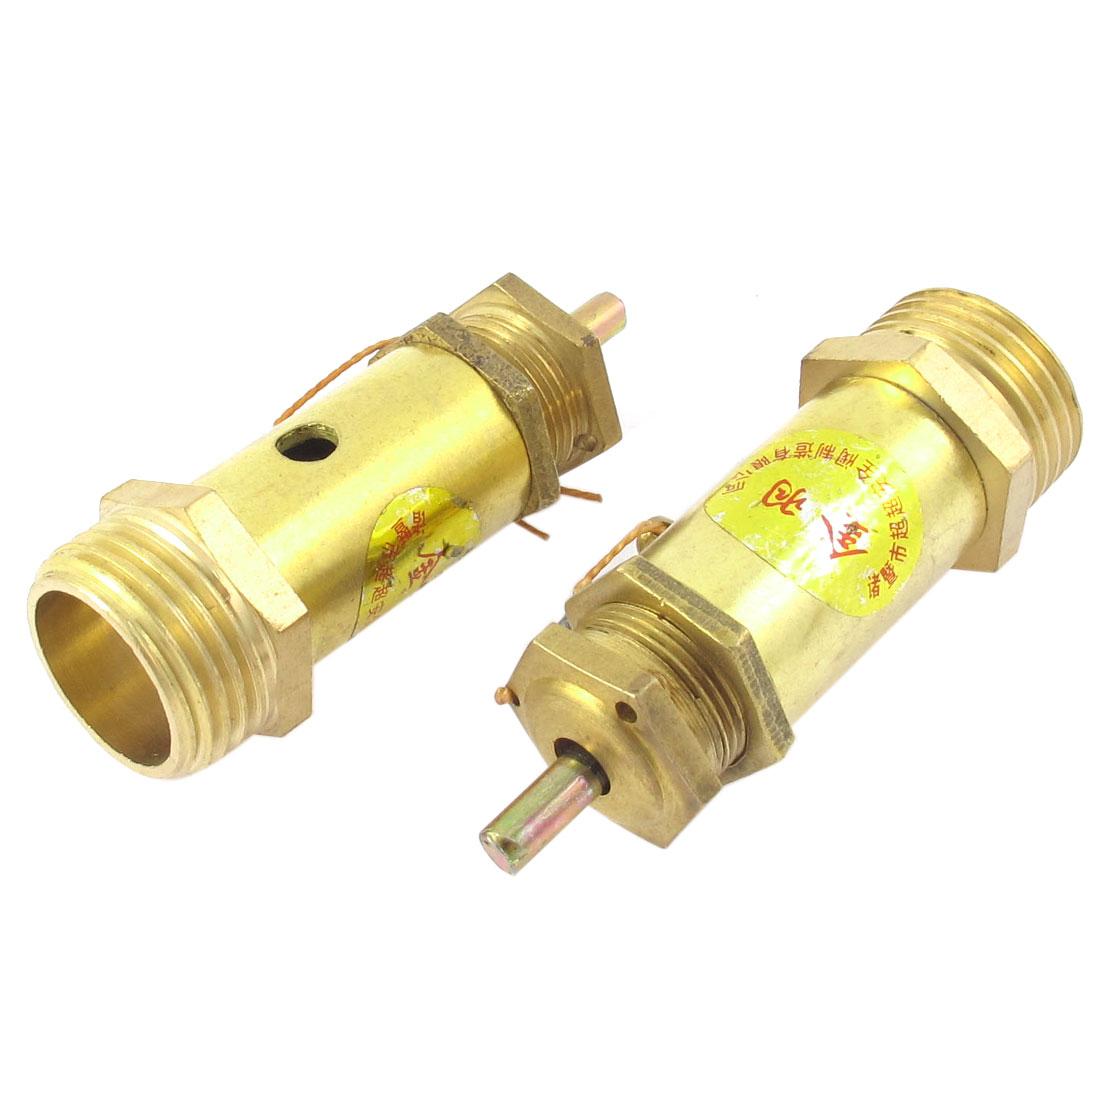 Metal Air Compressor Male Thread Safe Pressure Relief Valve Gold Tone